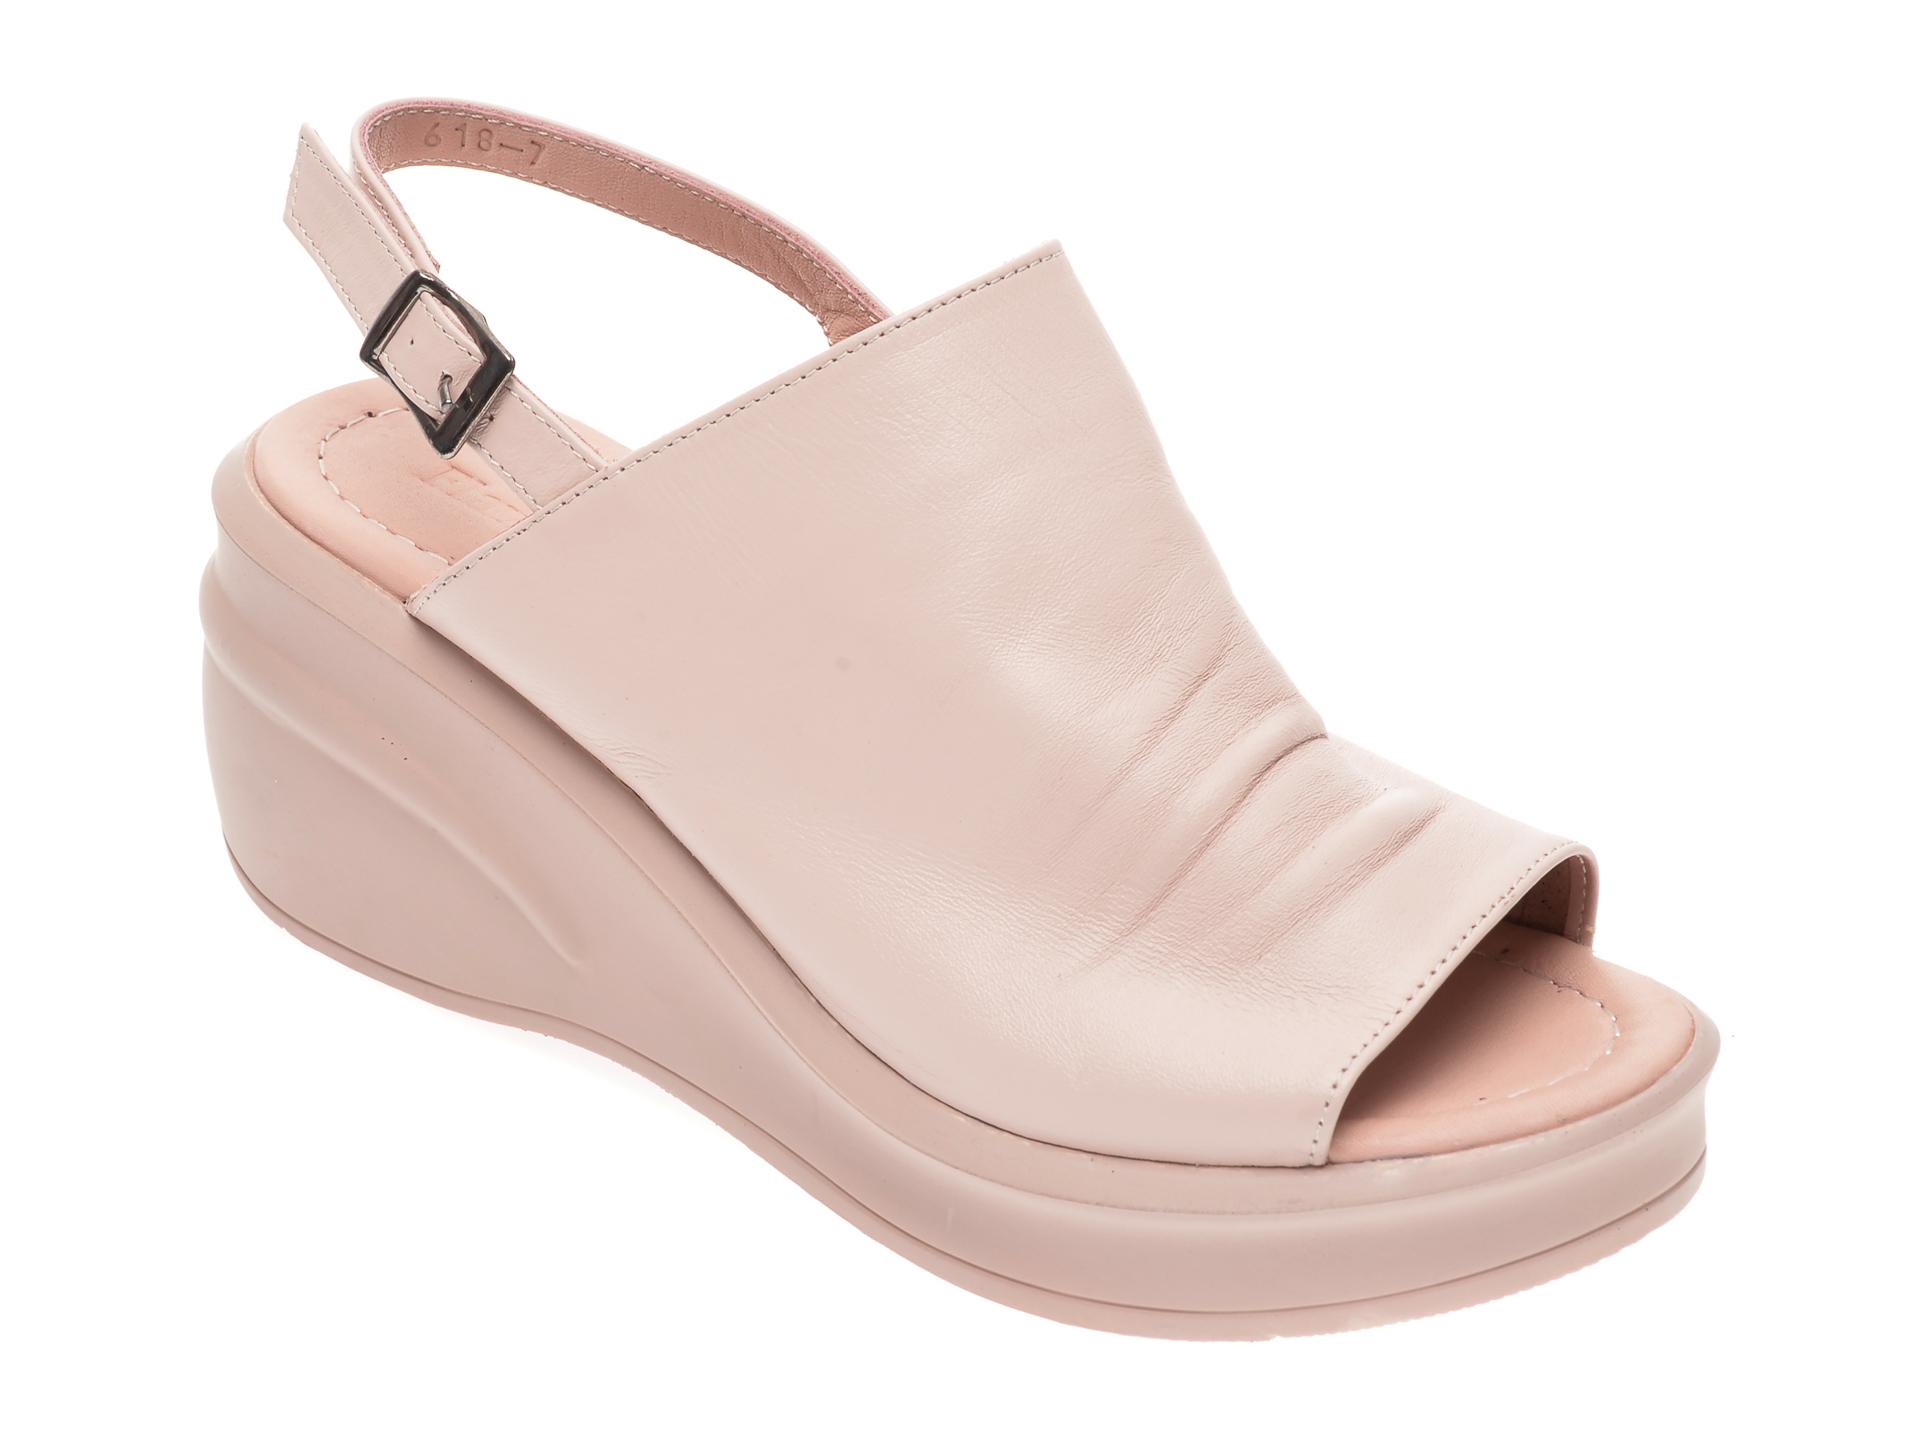 Sandale FLAVIA PASSINI roz, 123618, din piele naturala